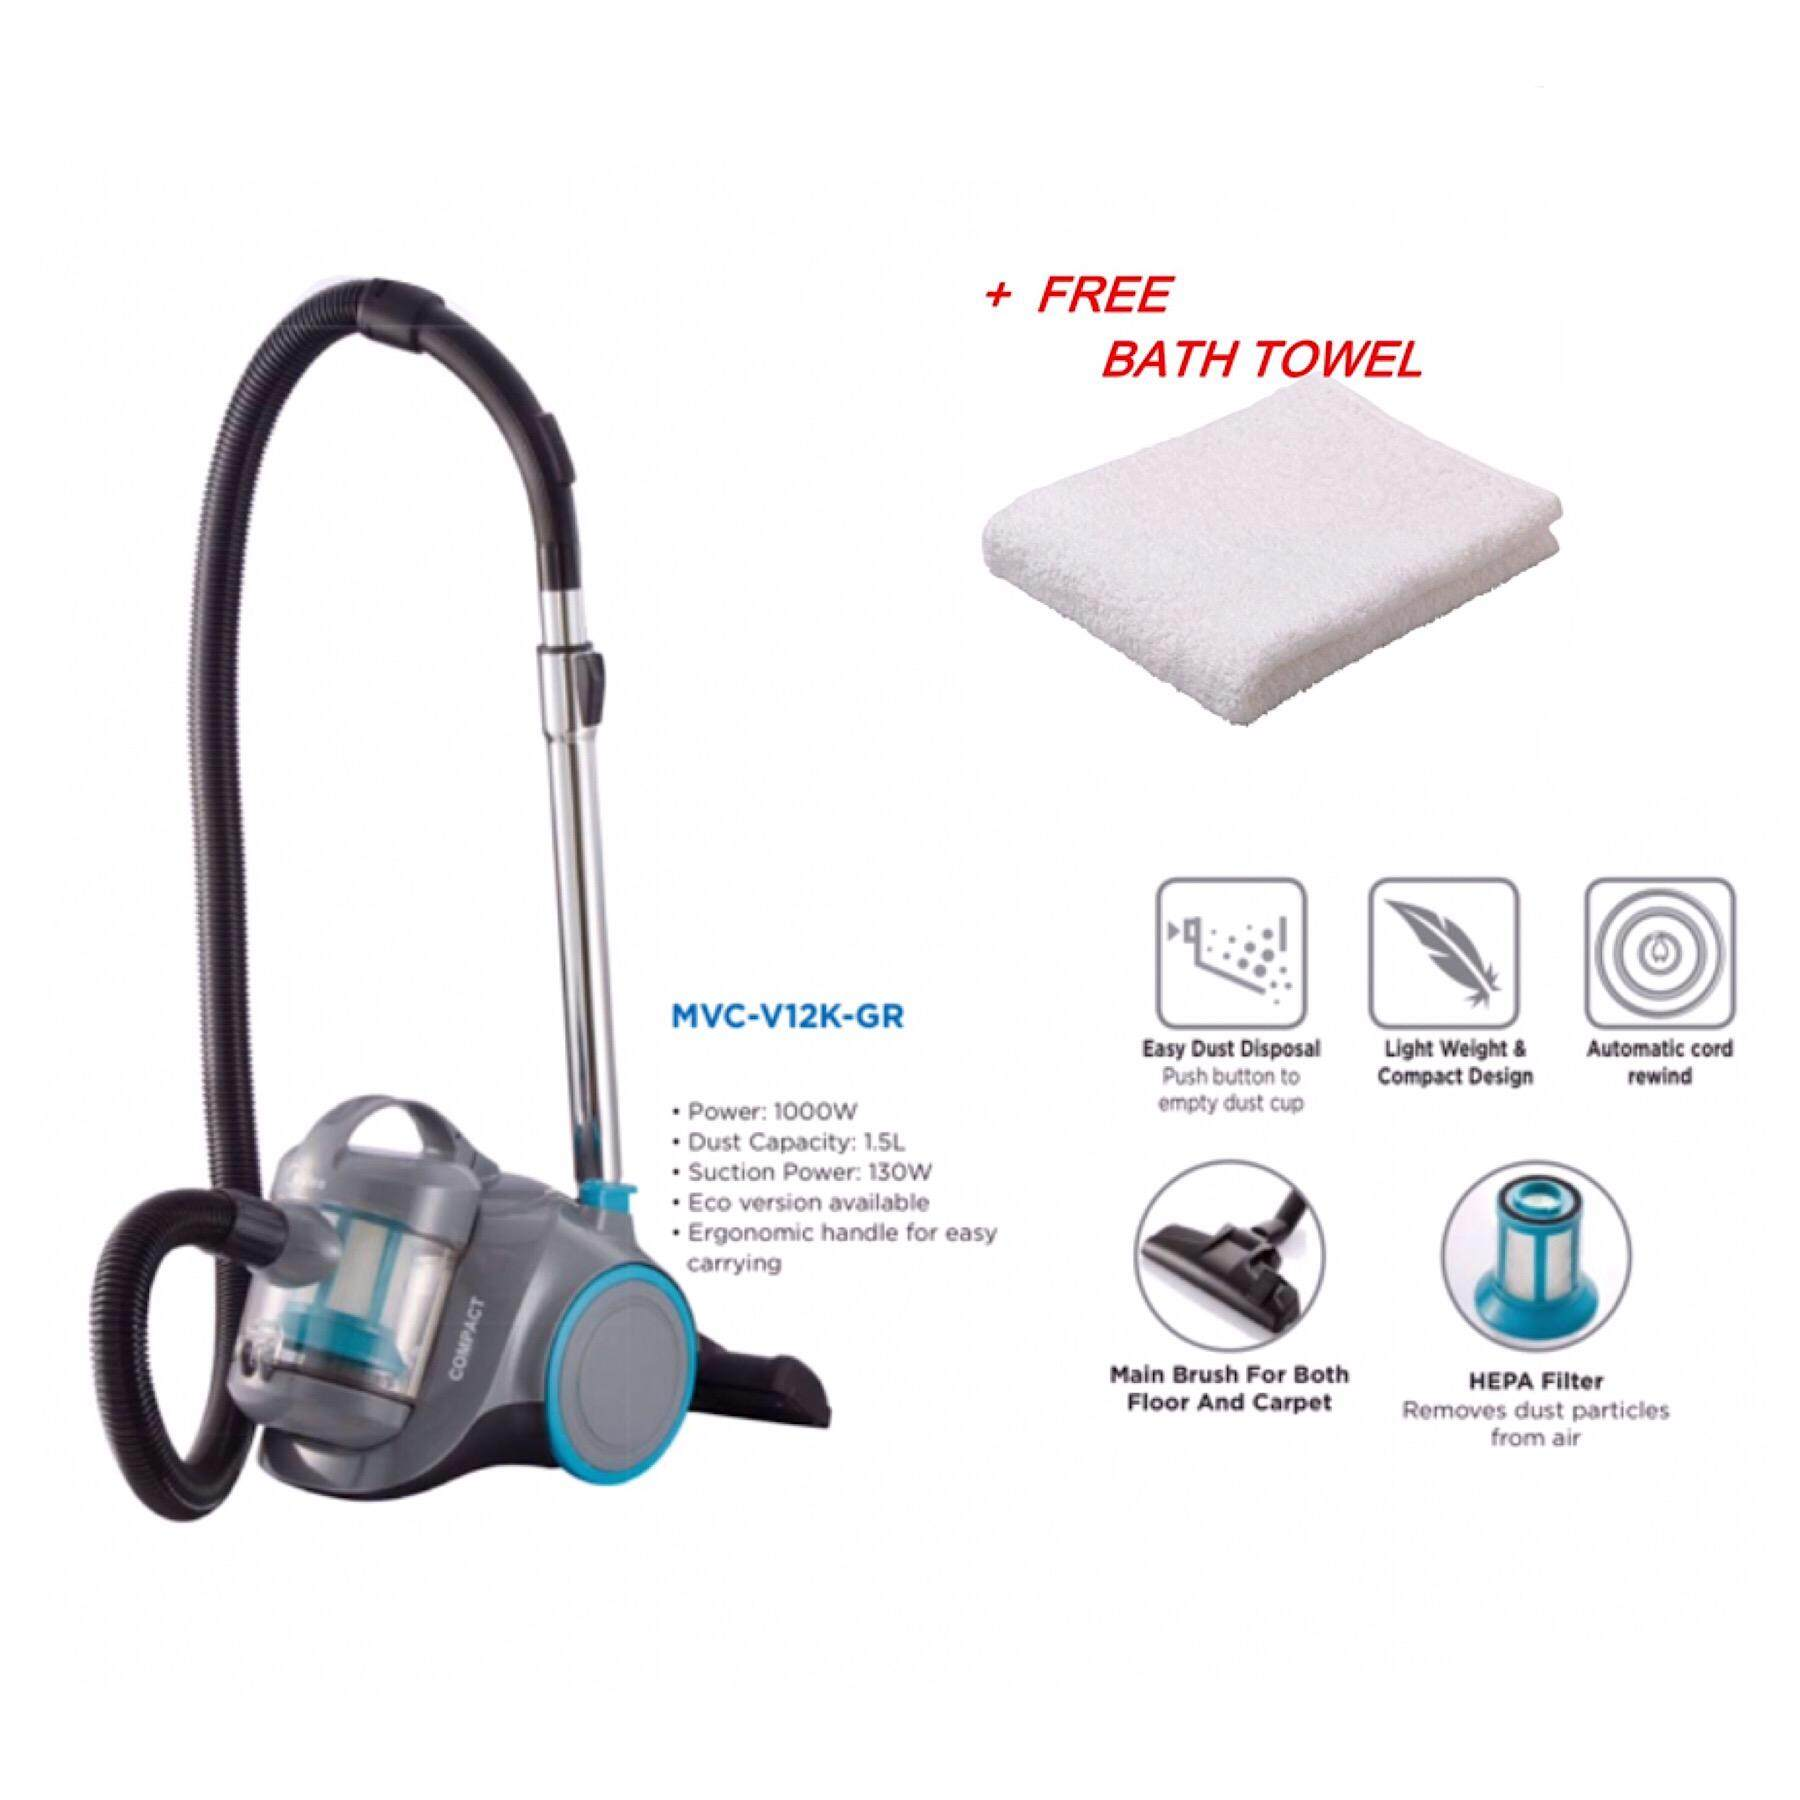 Midea MVC-V12K Bagless Vacuum Cleaner with HEPA Filter(1000W) + TOWEL